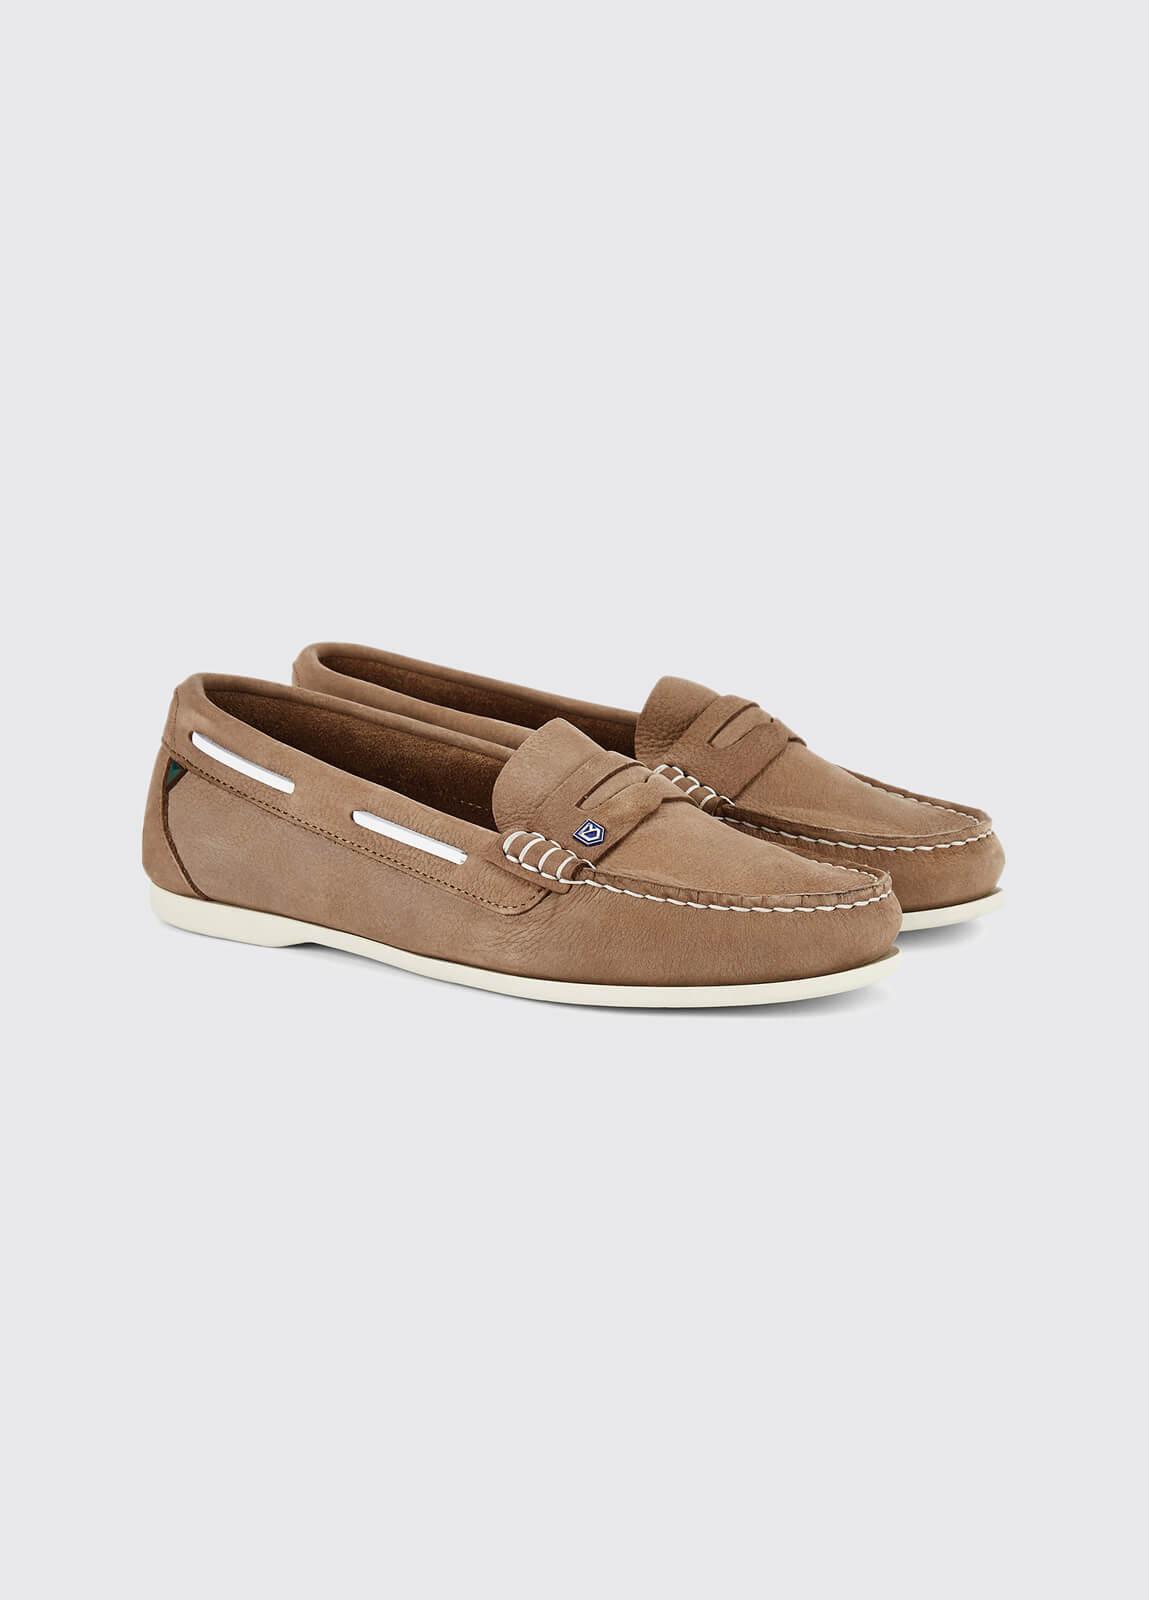 Belize Deck Shoe - Taupe